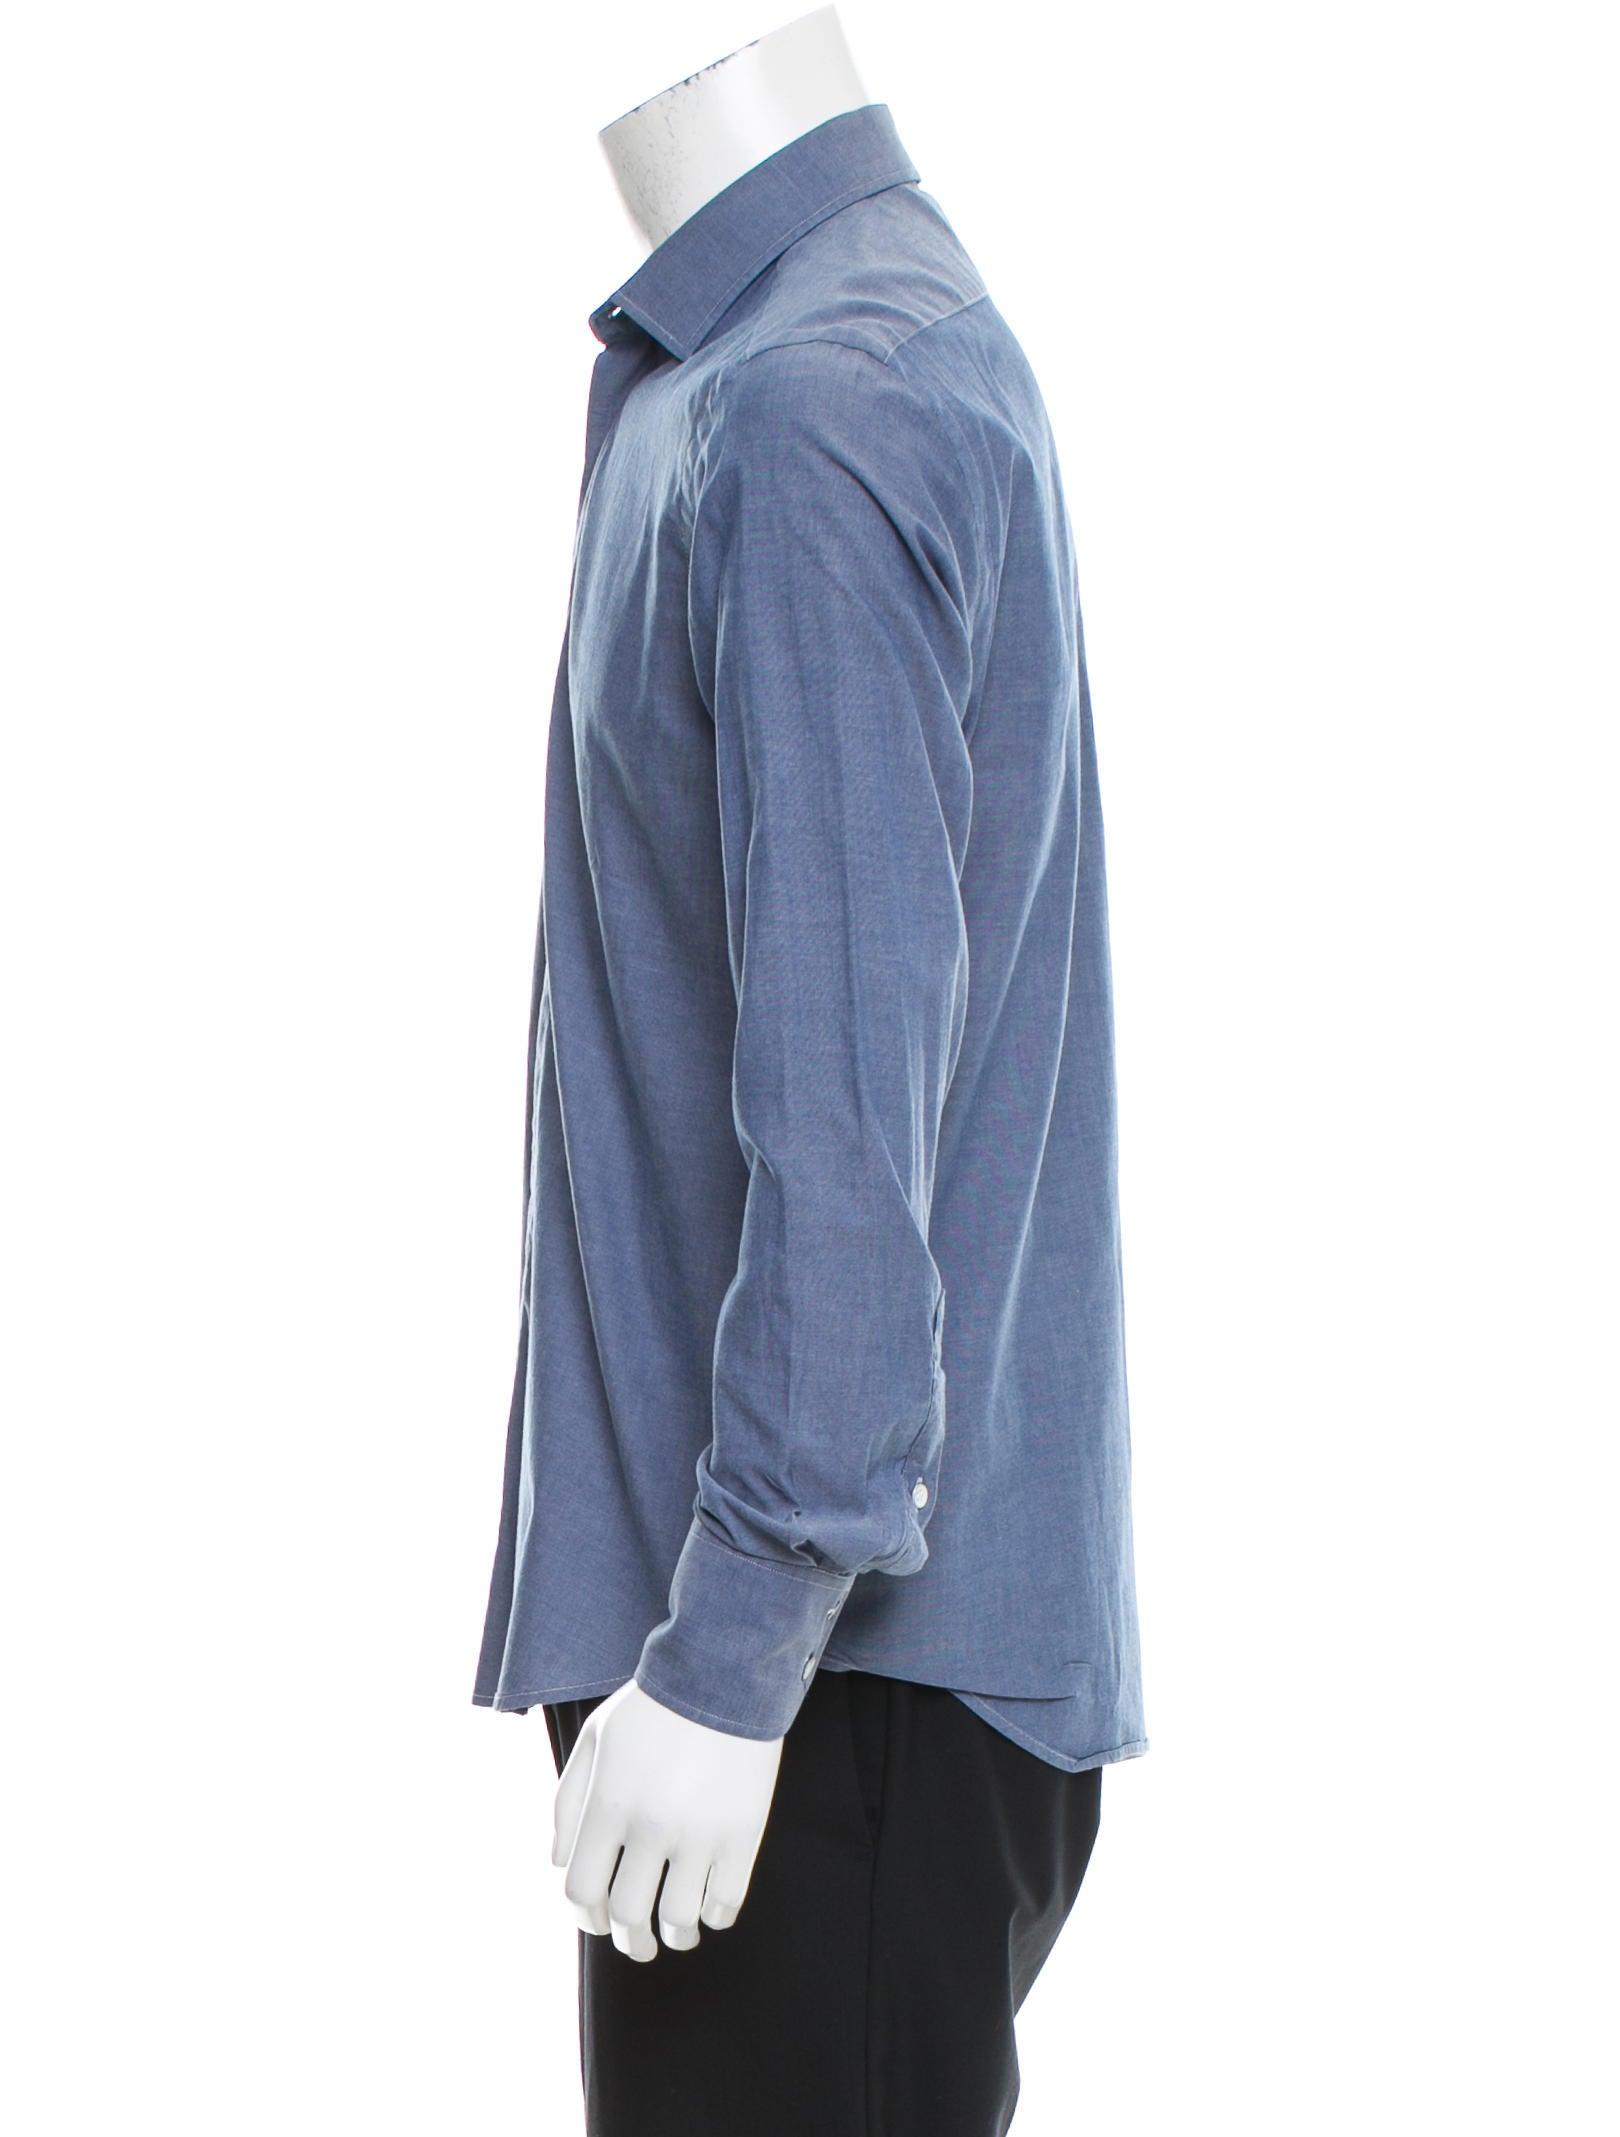 Rag bone chambray button up shirt clothing for Rag bone shirt